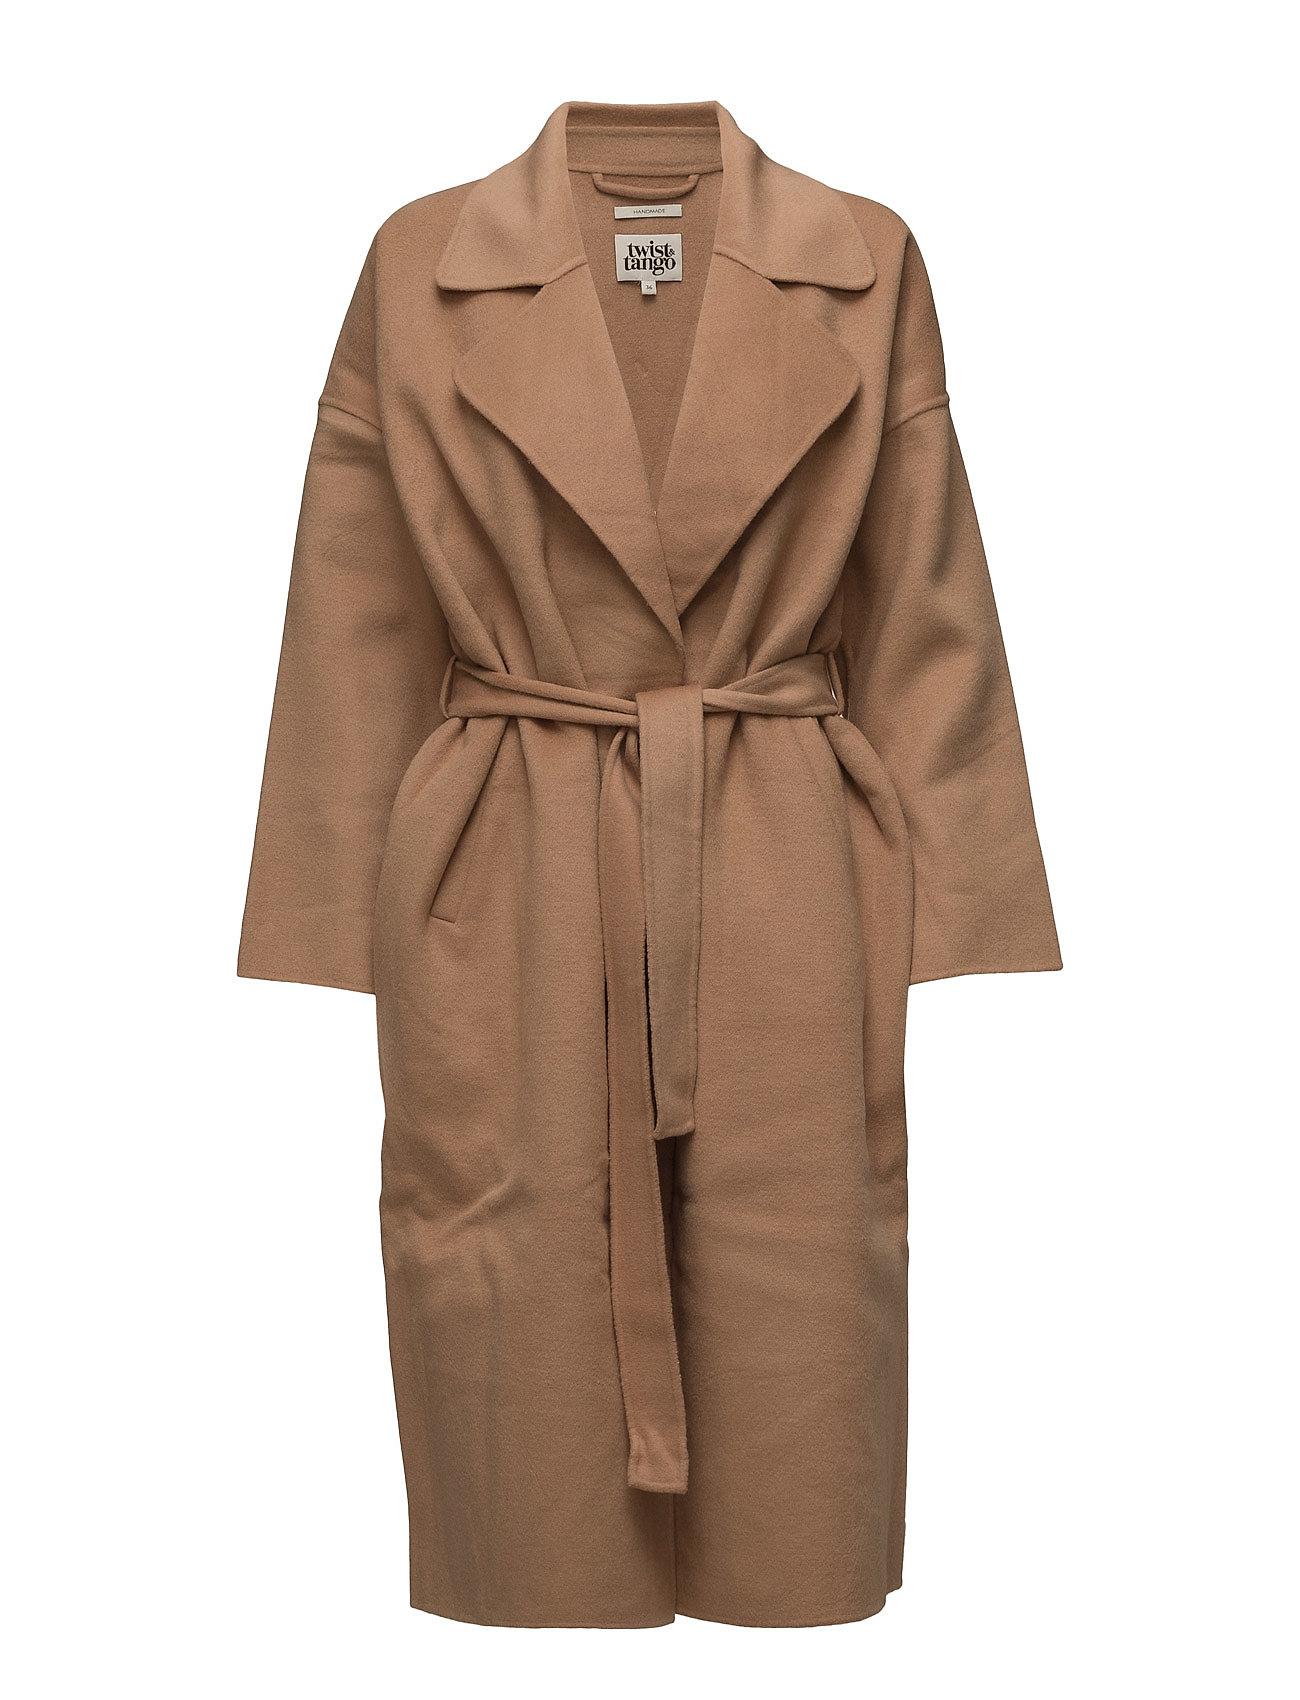 Twist & Tango Rania Coat